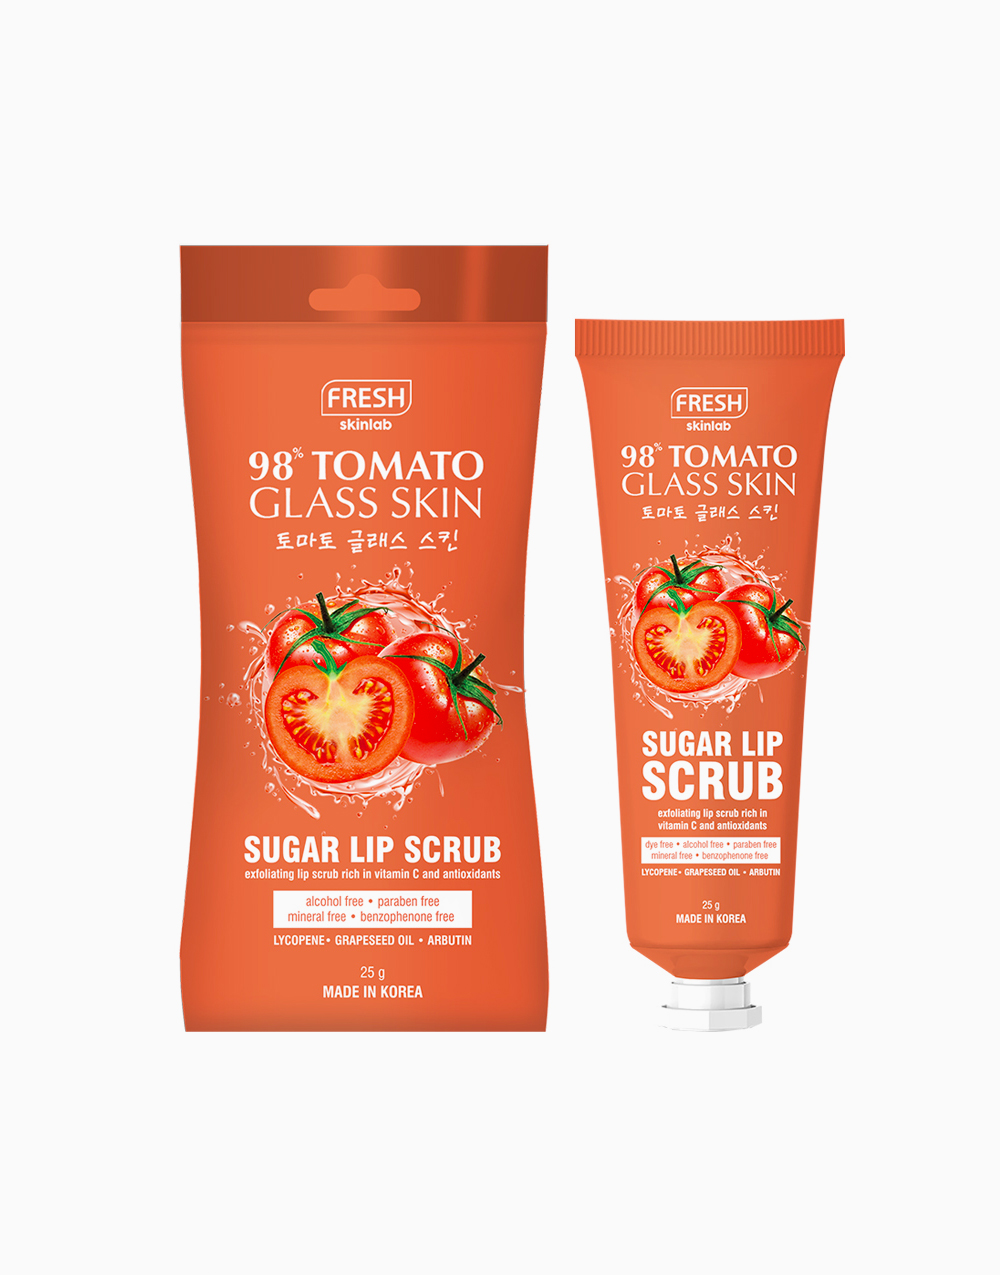 Fresh Skinlab Tomato Glass Skin Sugar Lip Therapy Scrub (25g) by Fresh Philippines